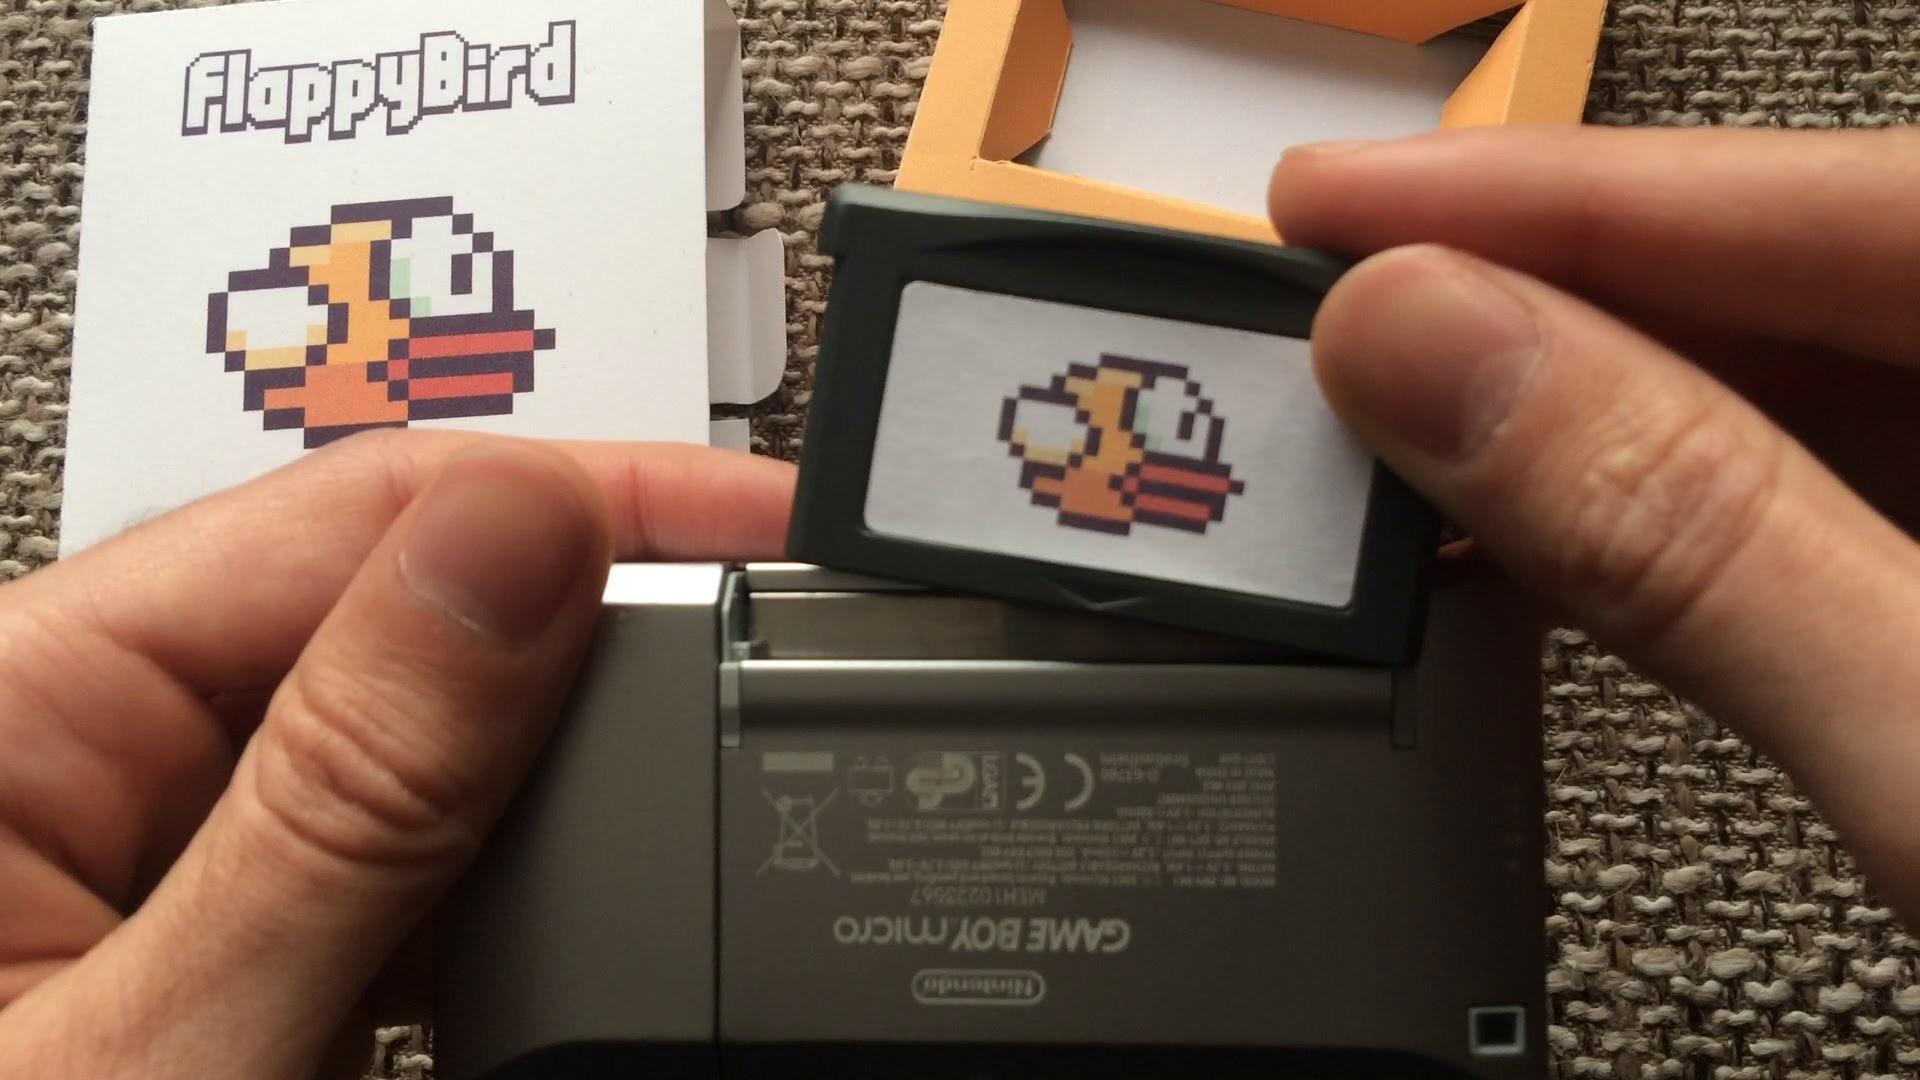 Flappy Bird for Game Boy Advance